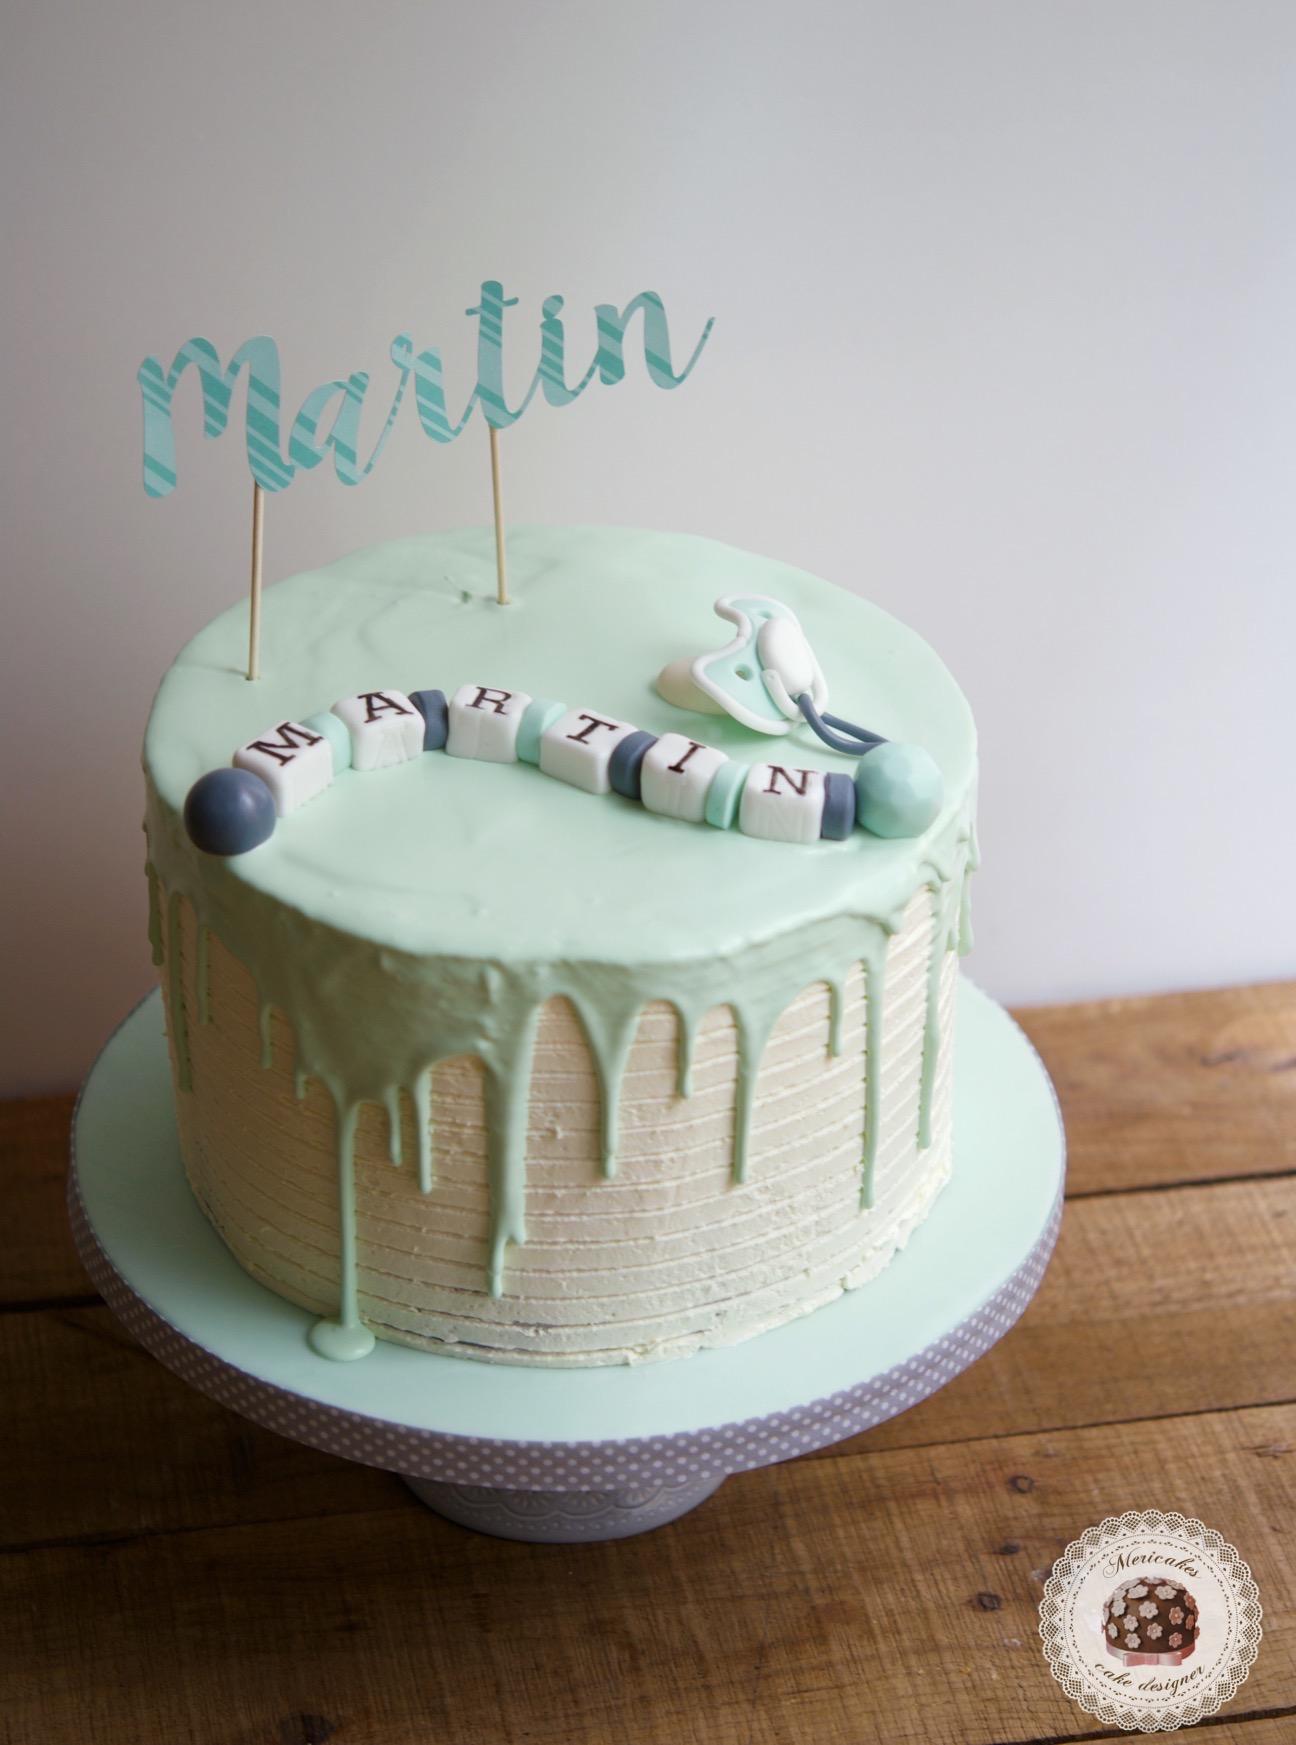 Tarta bautizo, baptism cake, mericakes, drip cake, cream cake, baby cake, barcelona, tartas decoradas, tartas barcelona, chocolate, topper, chupete, sujeta chupete, cake artist 1